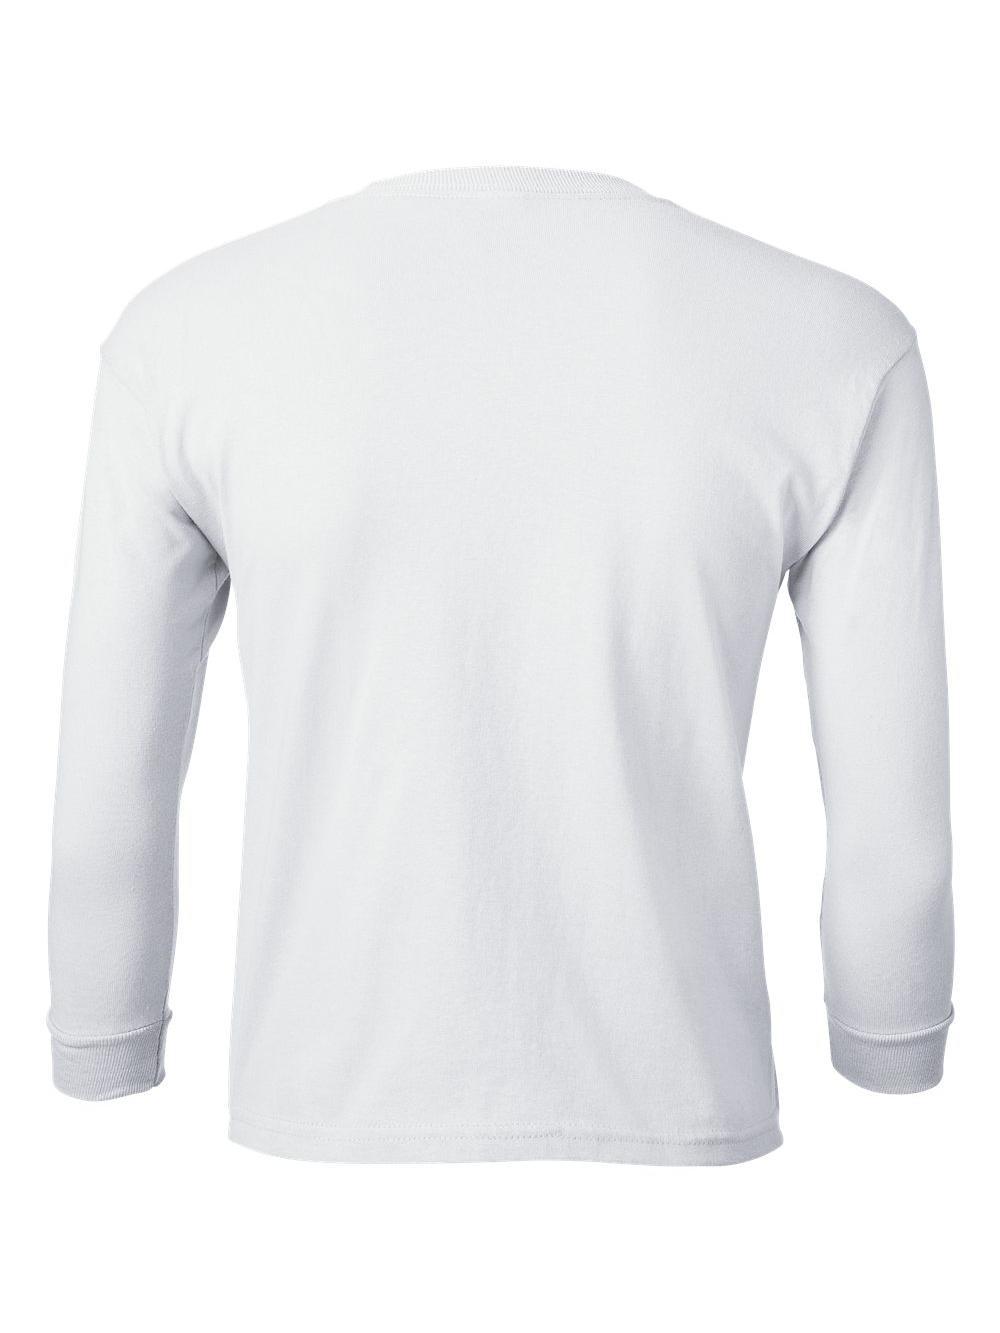 Gildan-Ultra-Cotton-Youth-Long-Sleeve-T-Shirt-2400B thumbnail 46